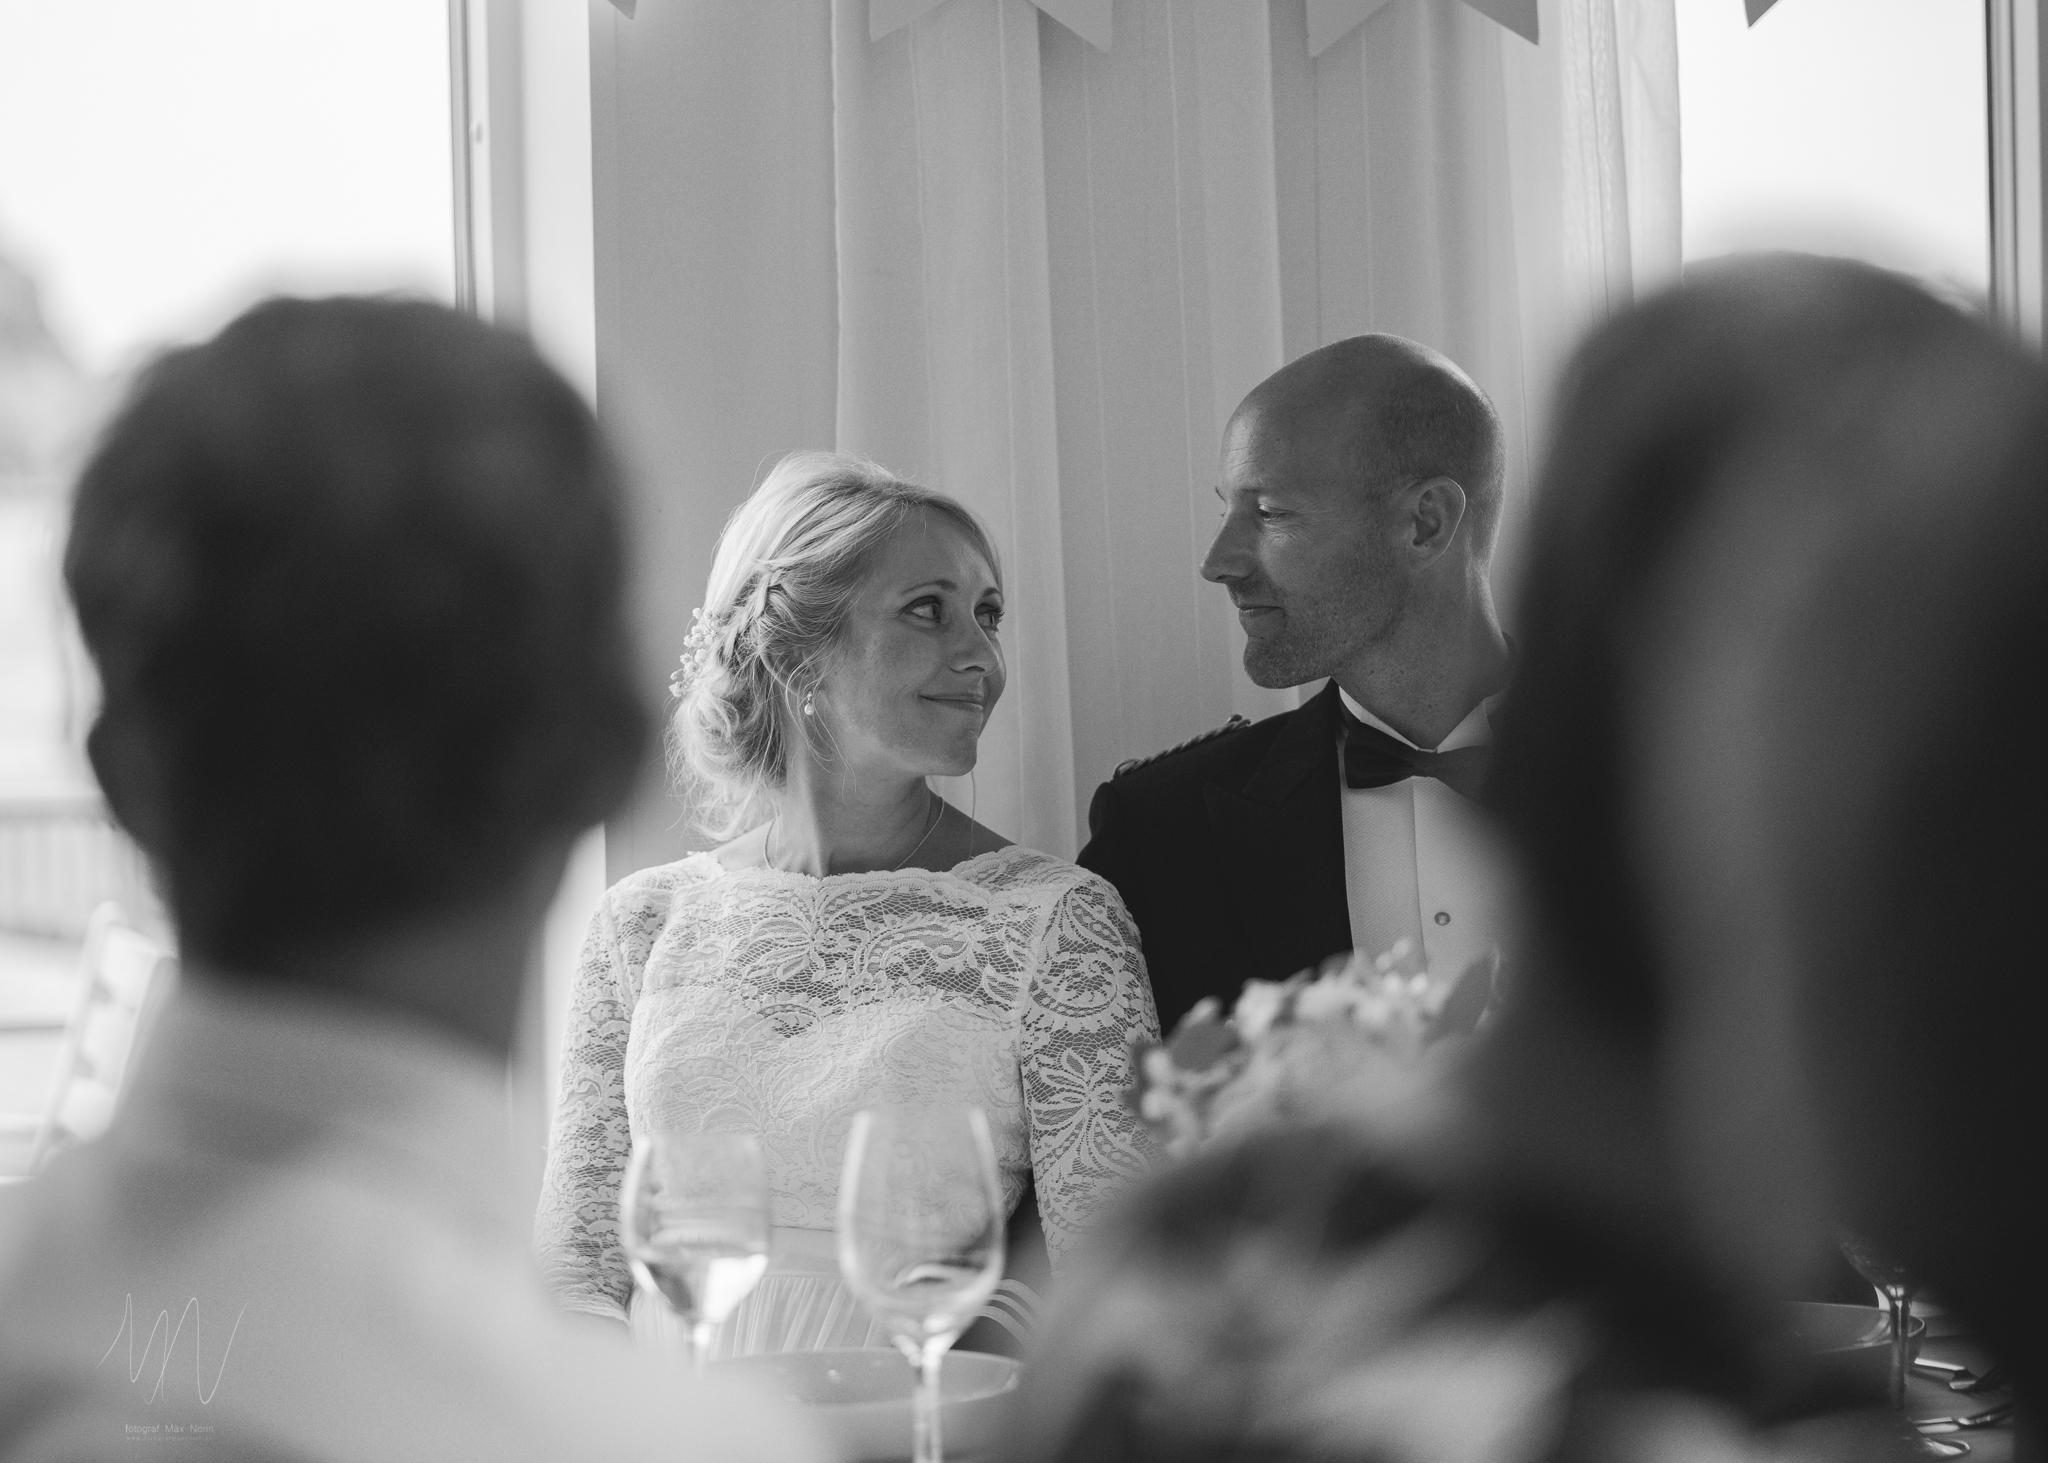 Bröllop-fotografmaxnorin.se-MariaMarcus-461.JPG